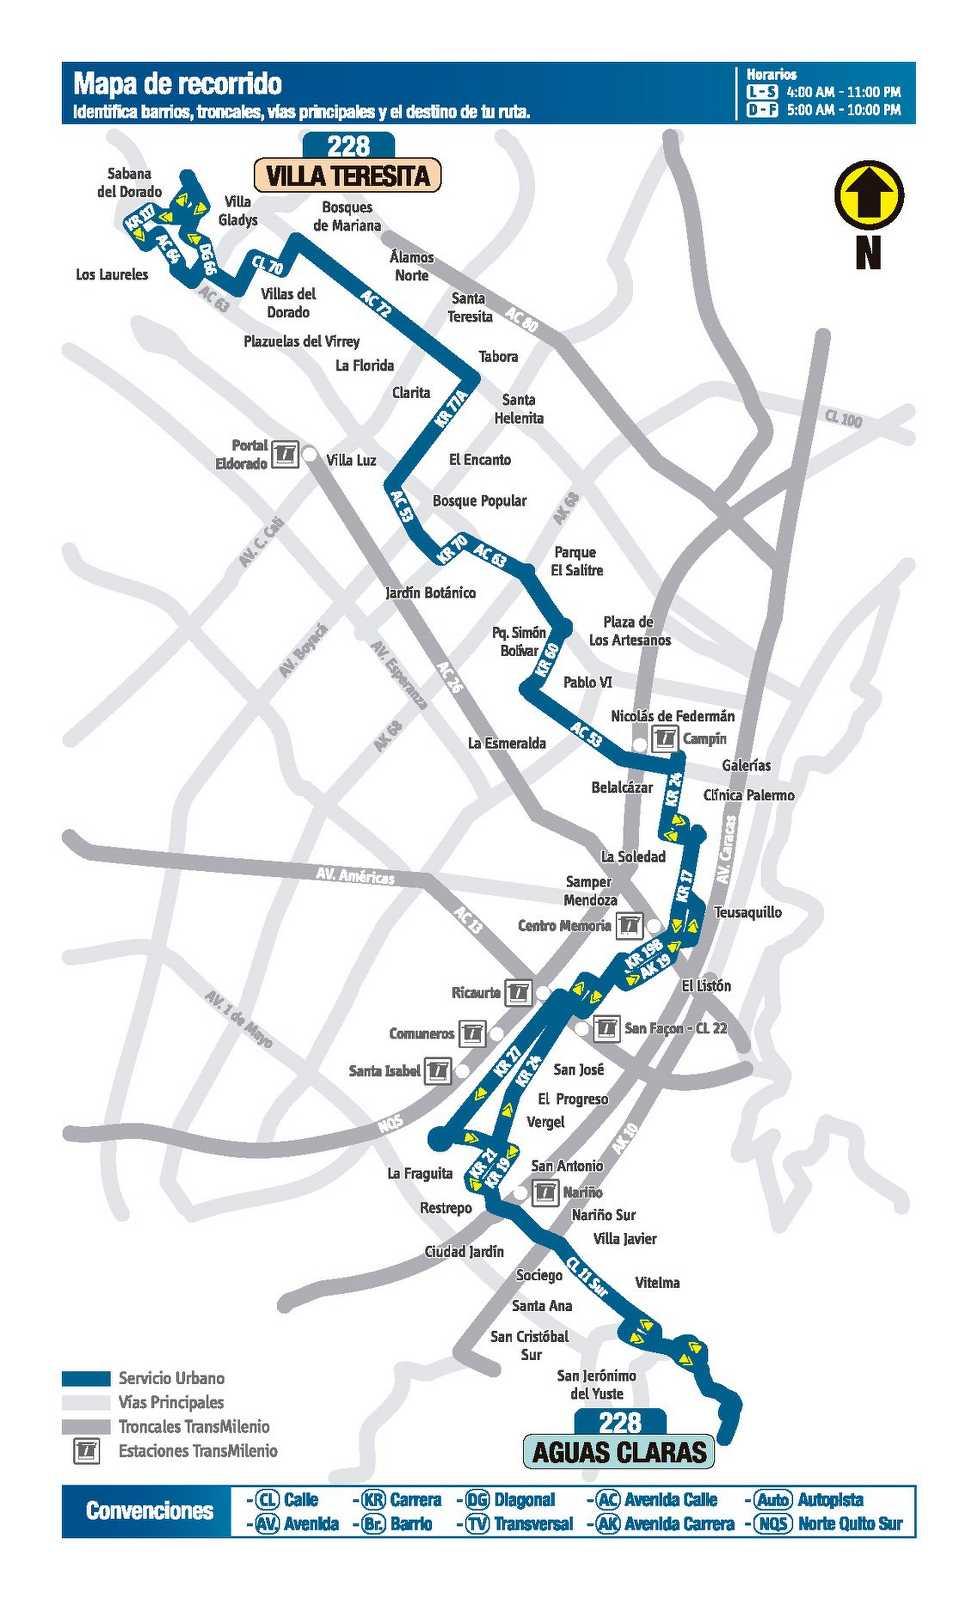 Ruta SITP: 228 Villa Teresita ↔ Aguas Claras (mapa)